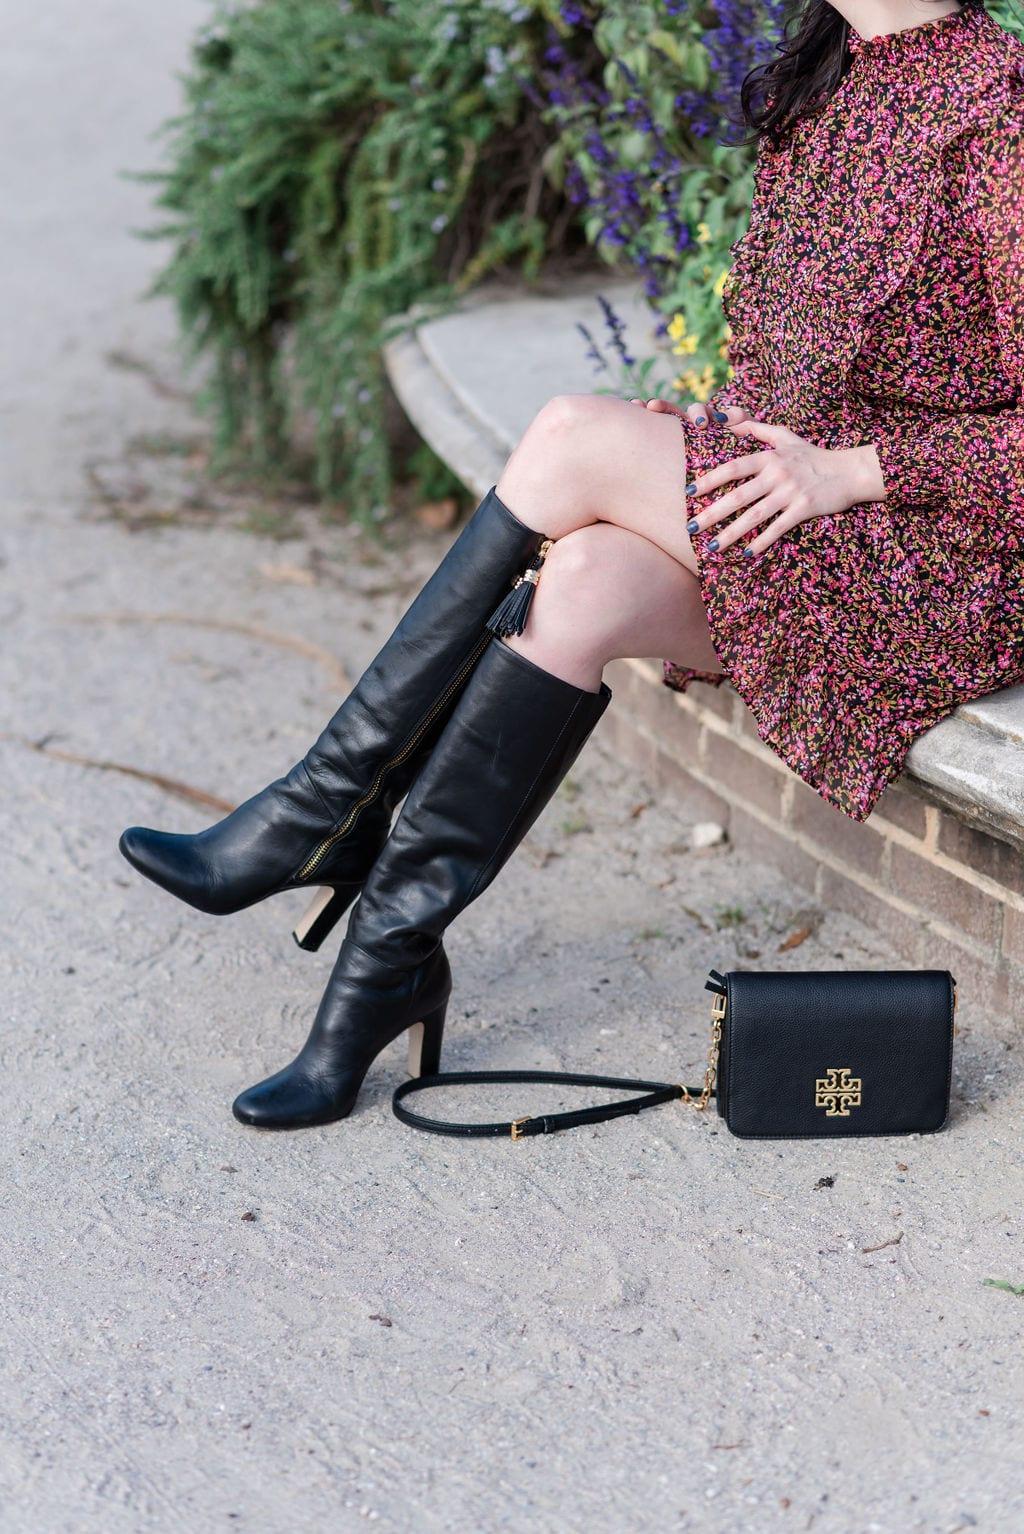 otk-boots-floral-dress-tory-burch-crossbody